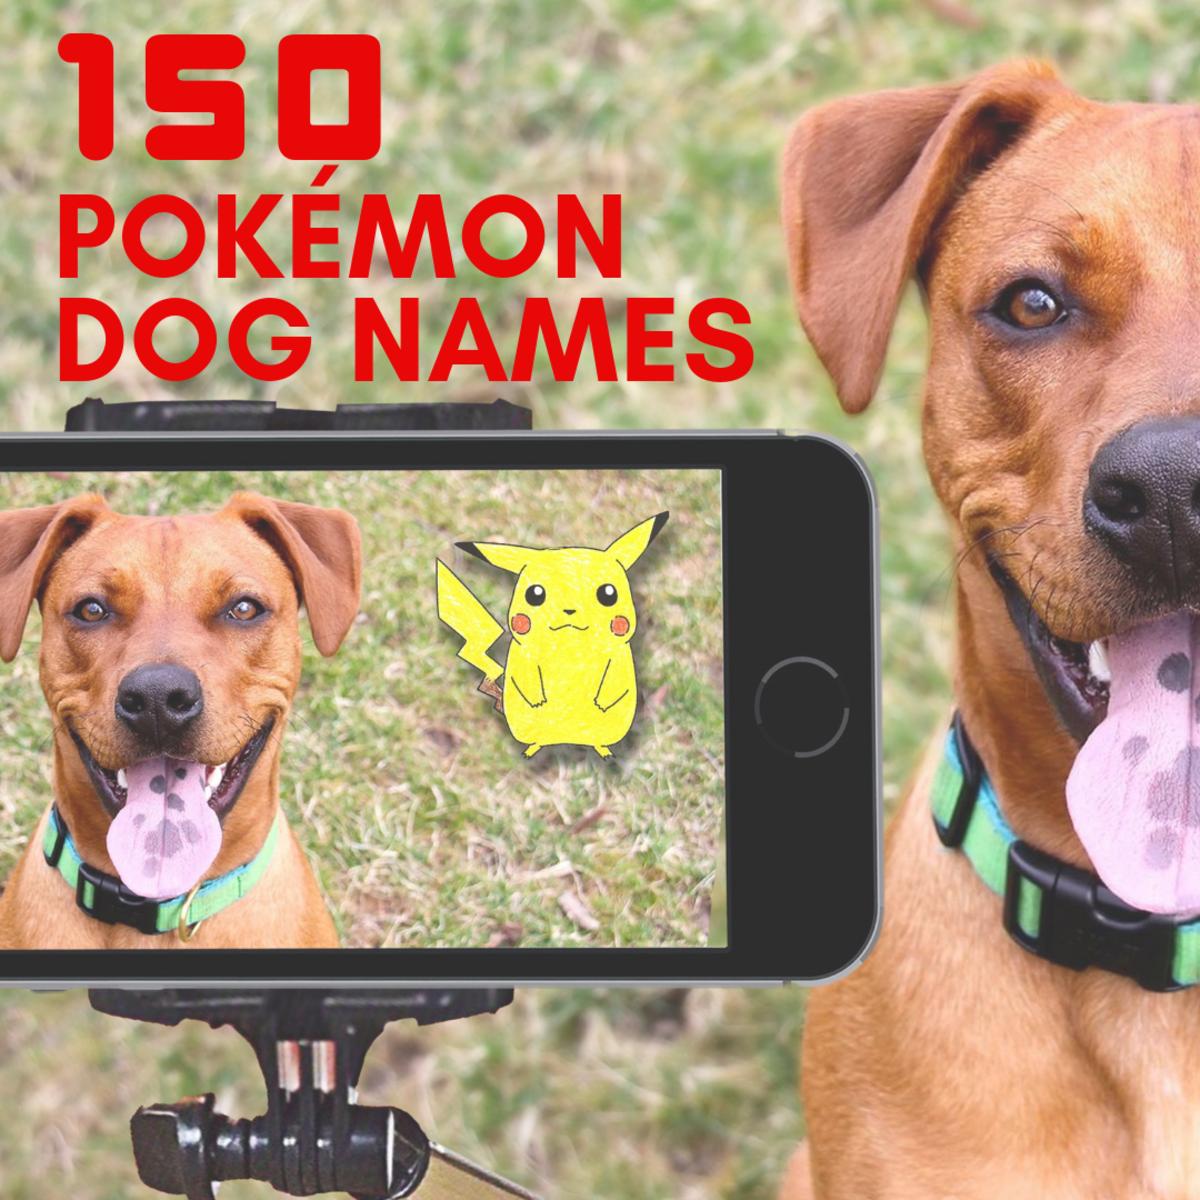 150 Pokémon Dog Names With Nicknames